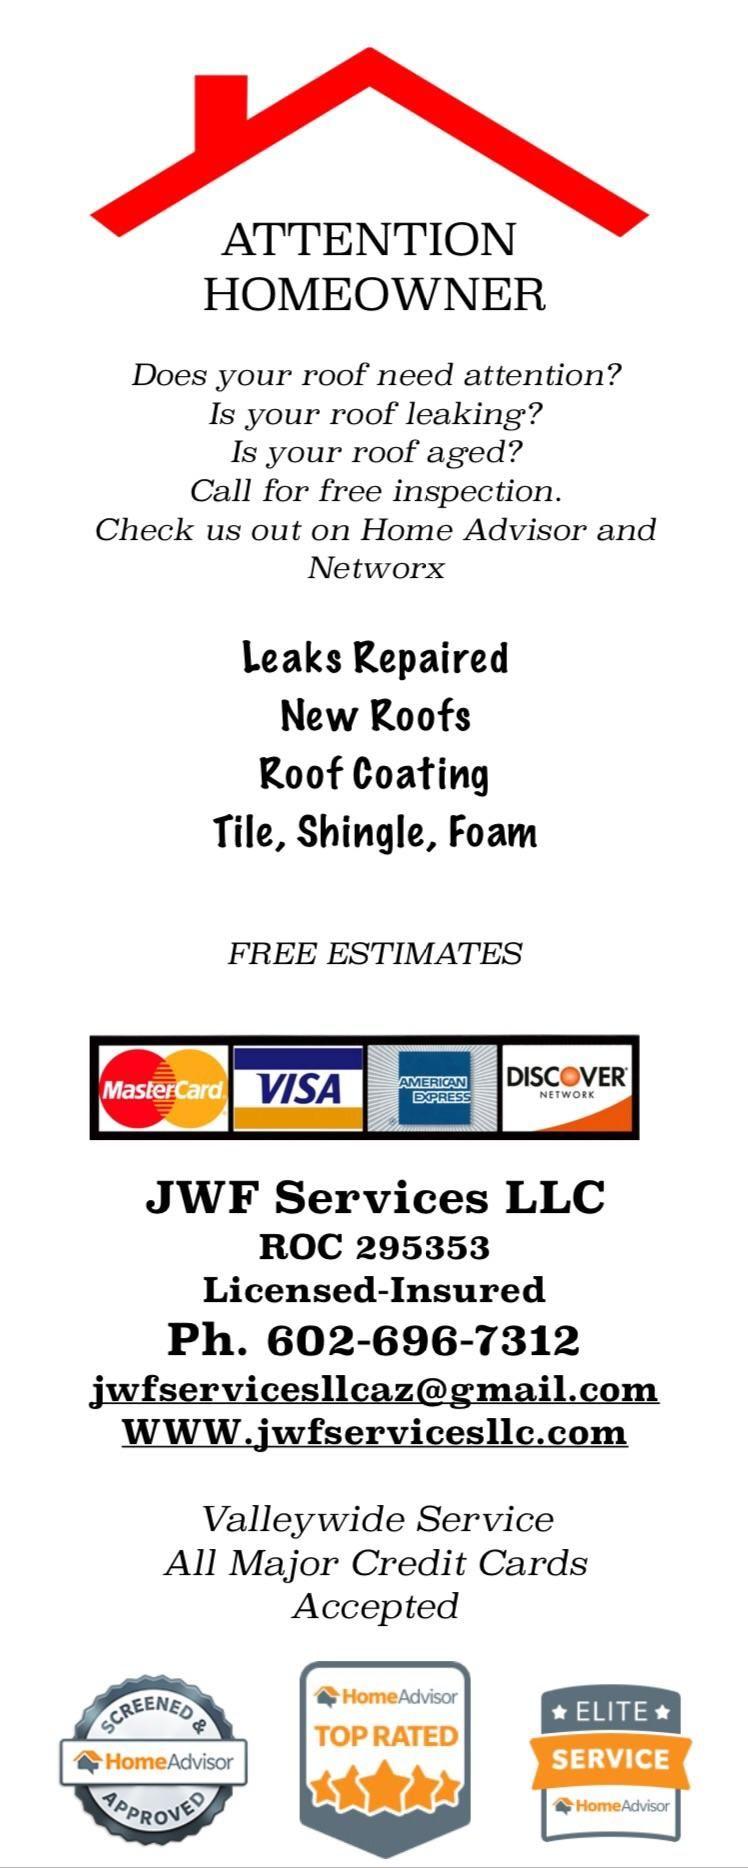 JWF Services LLC